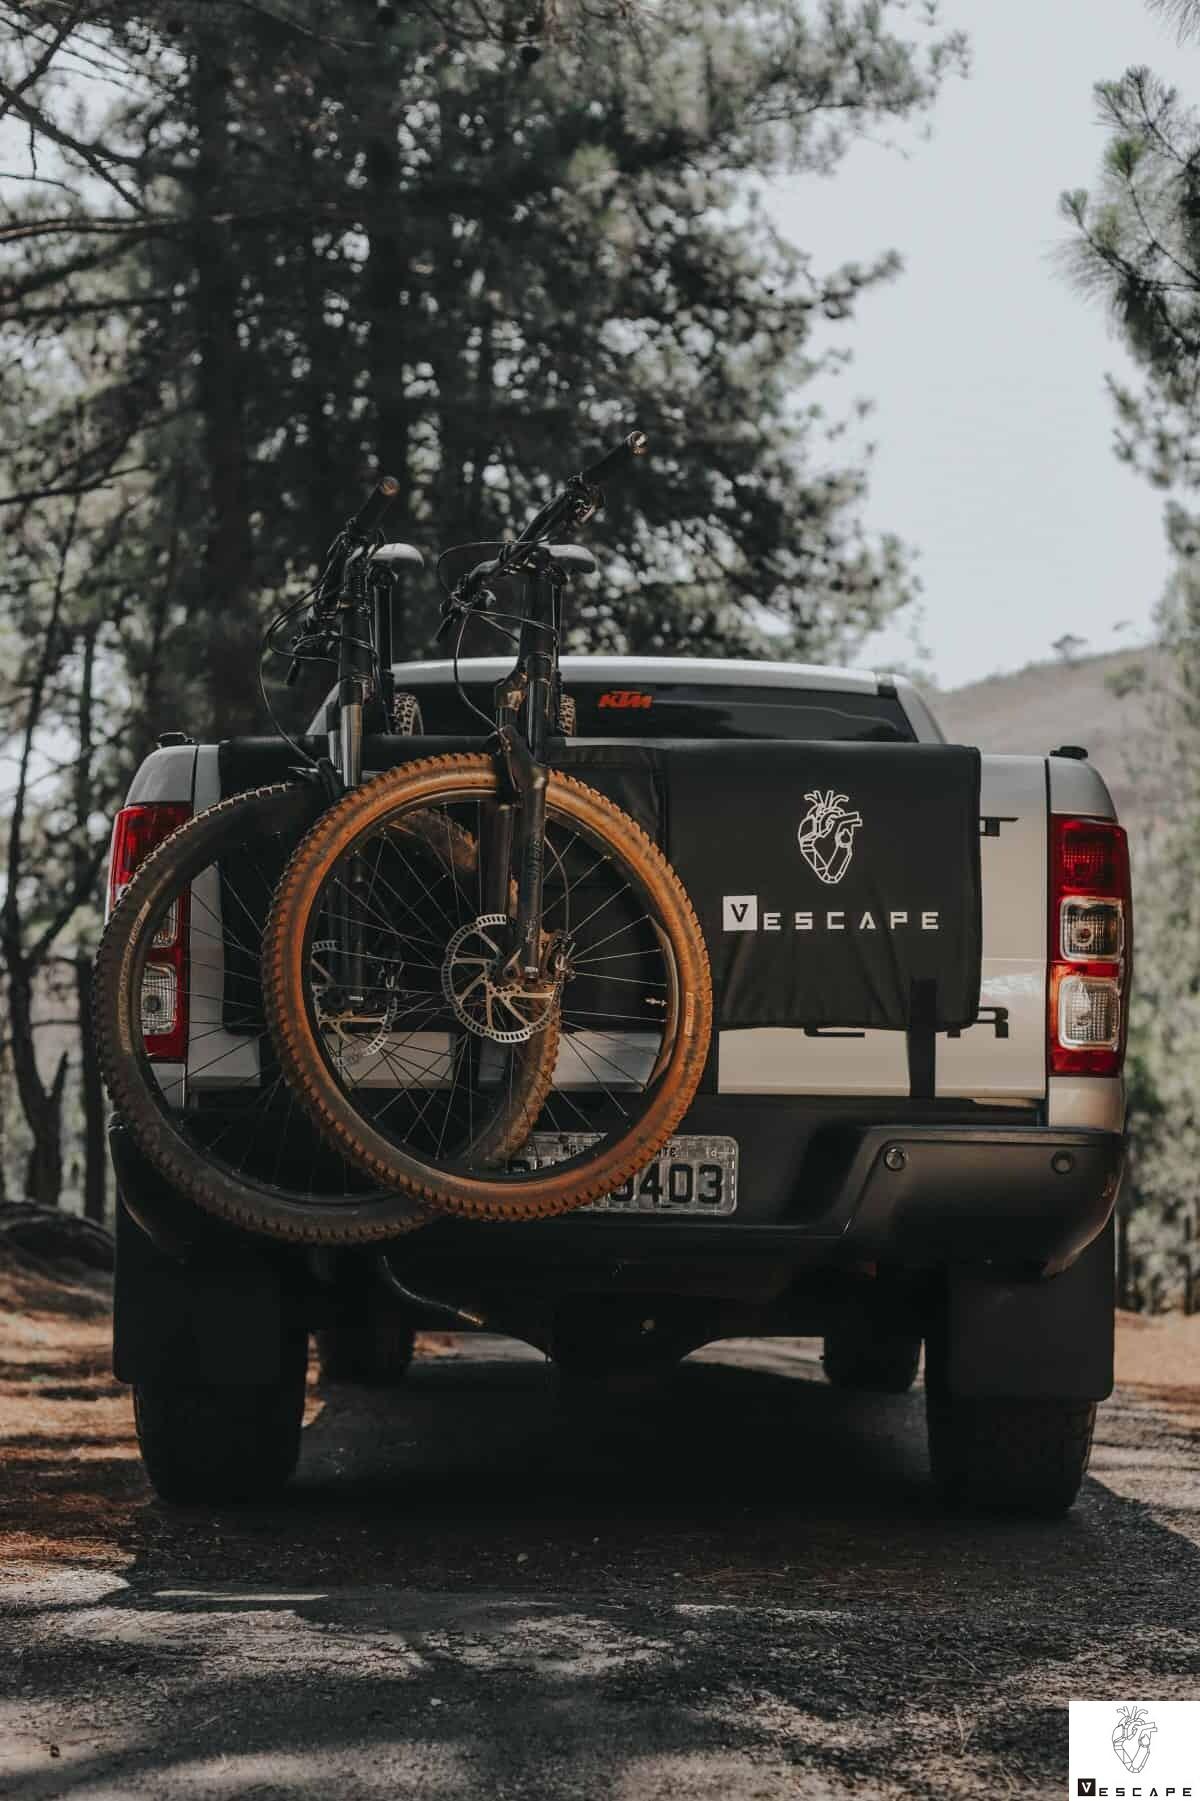 Foto 1 - TruckPad VEscape - Transbike Tamanhos P, M e G